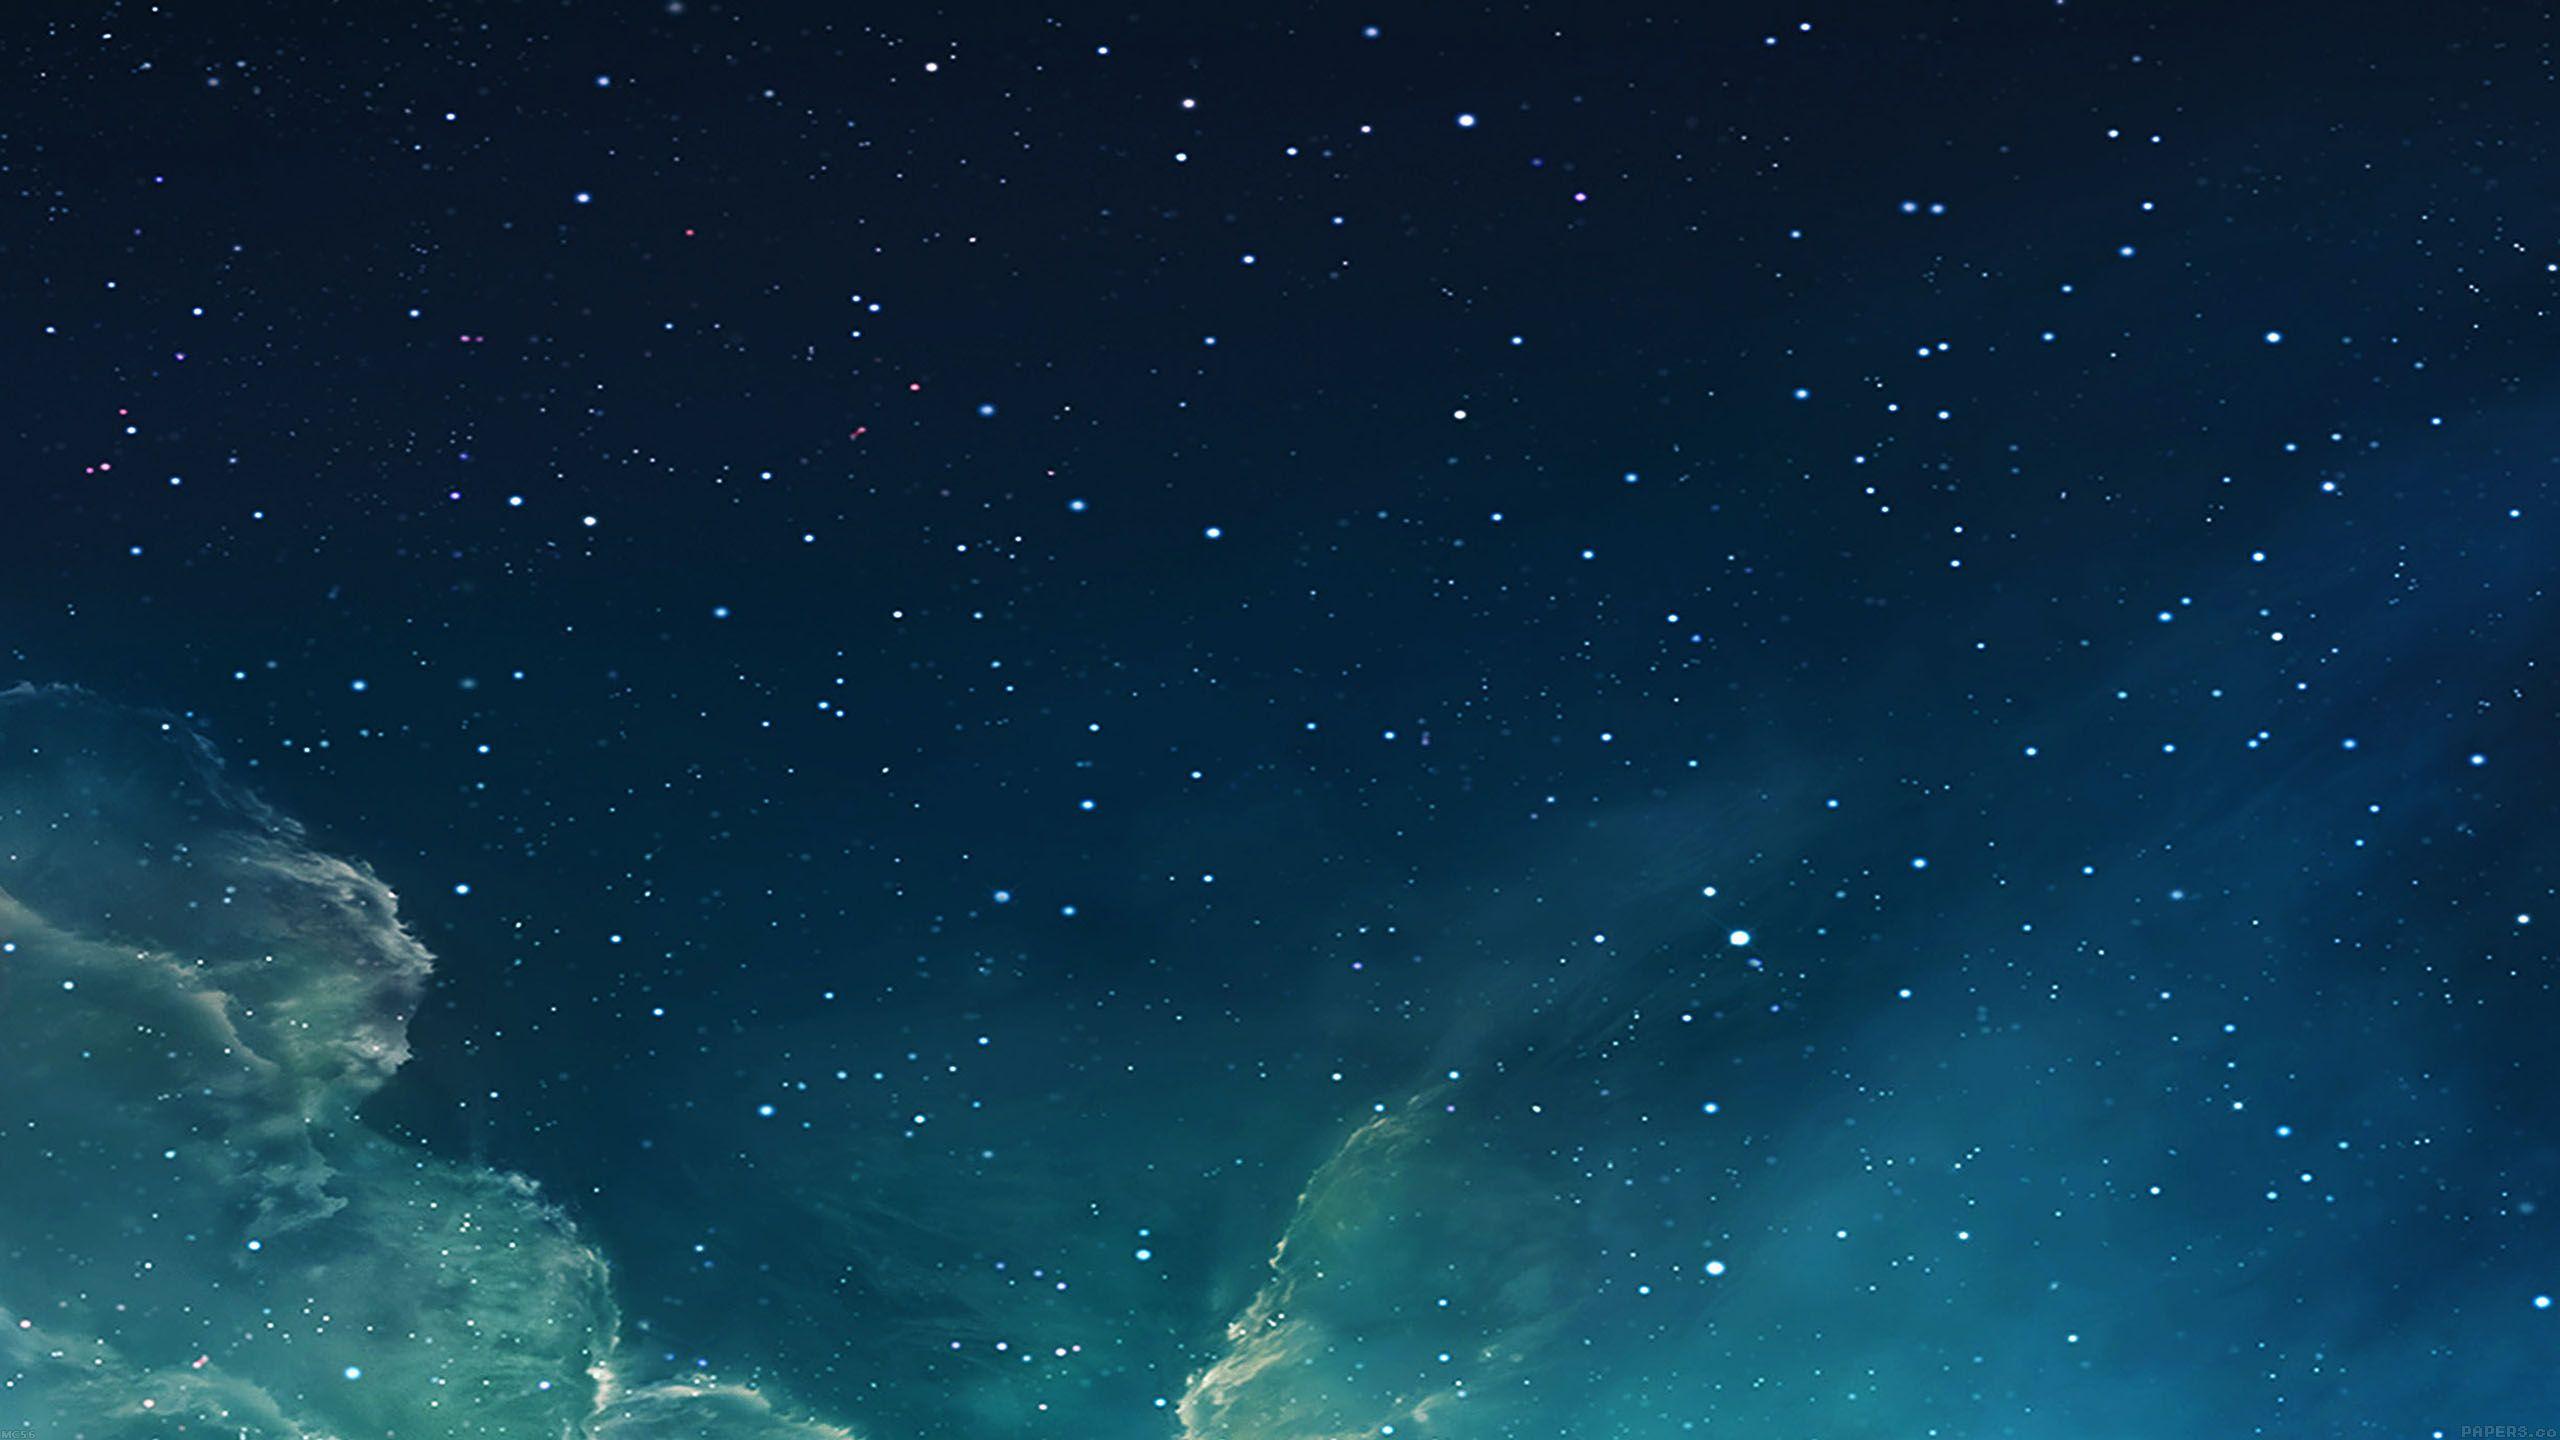 Galaxy Wallpaper 1080p Ios Blue Galaxy Wallpaper Star Sky Wallpaper Galaxy